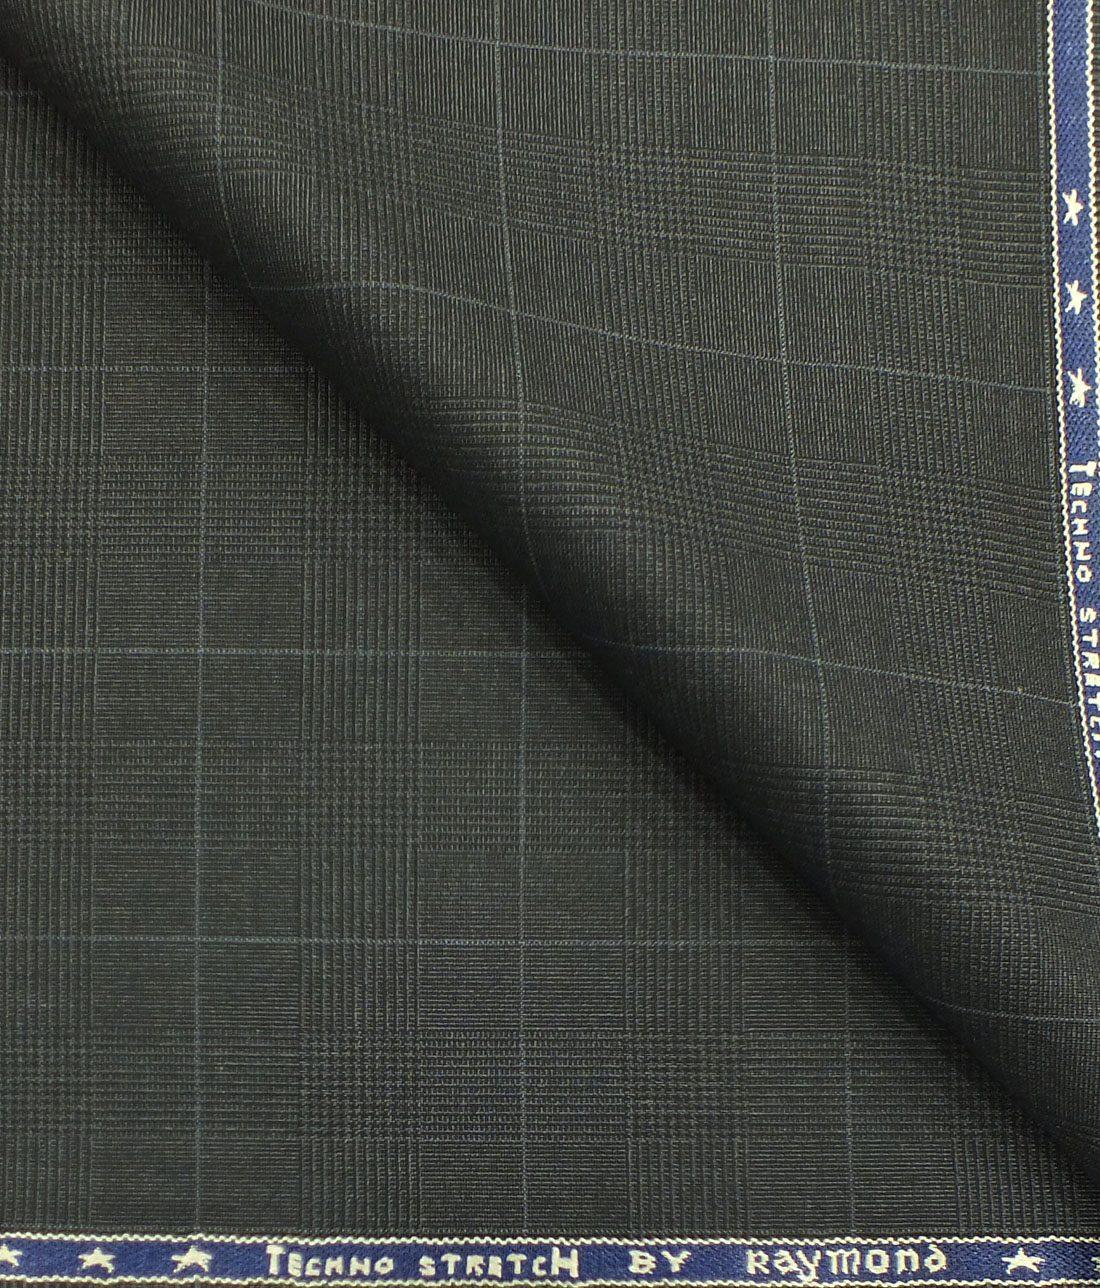 b560dd4a5 Raymond TechnoStretch Dark Grey Self Checks Poly Viscose Stretchable Trouser  or 3 Piece Suit Fabric (Unstitched ...